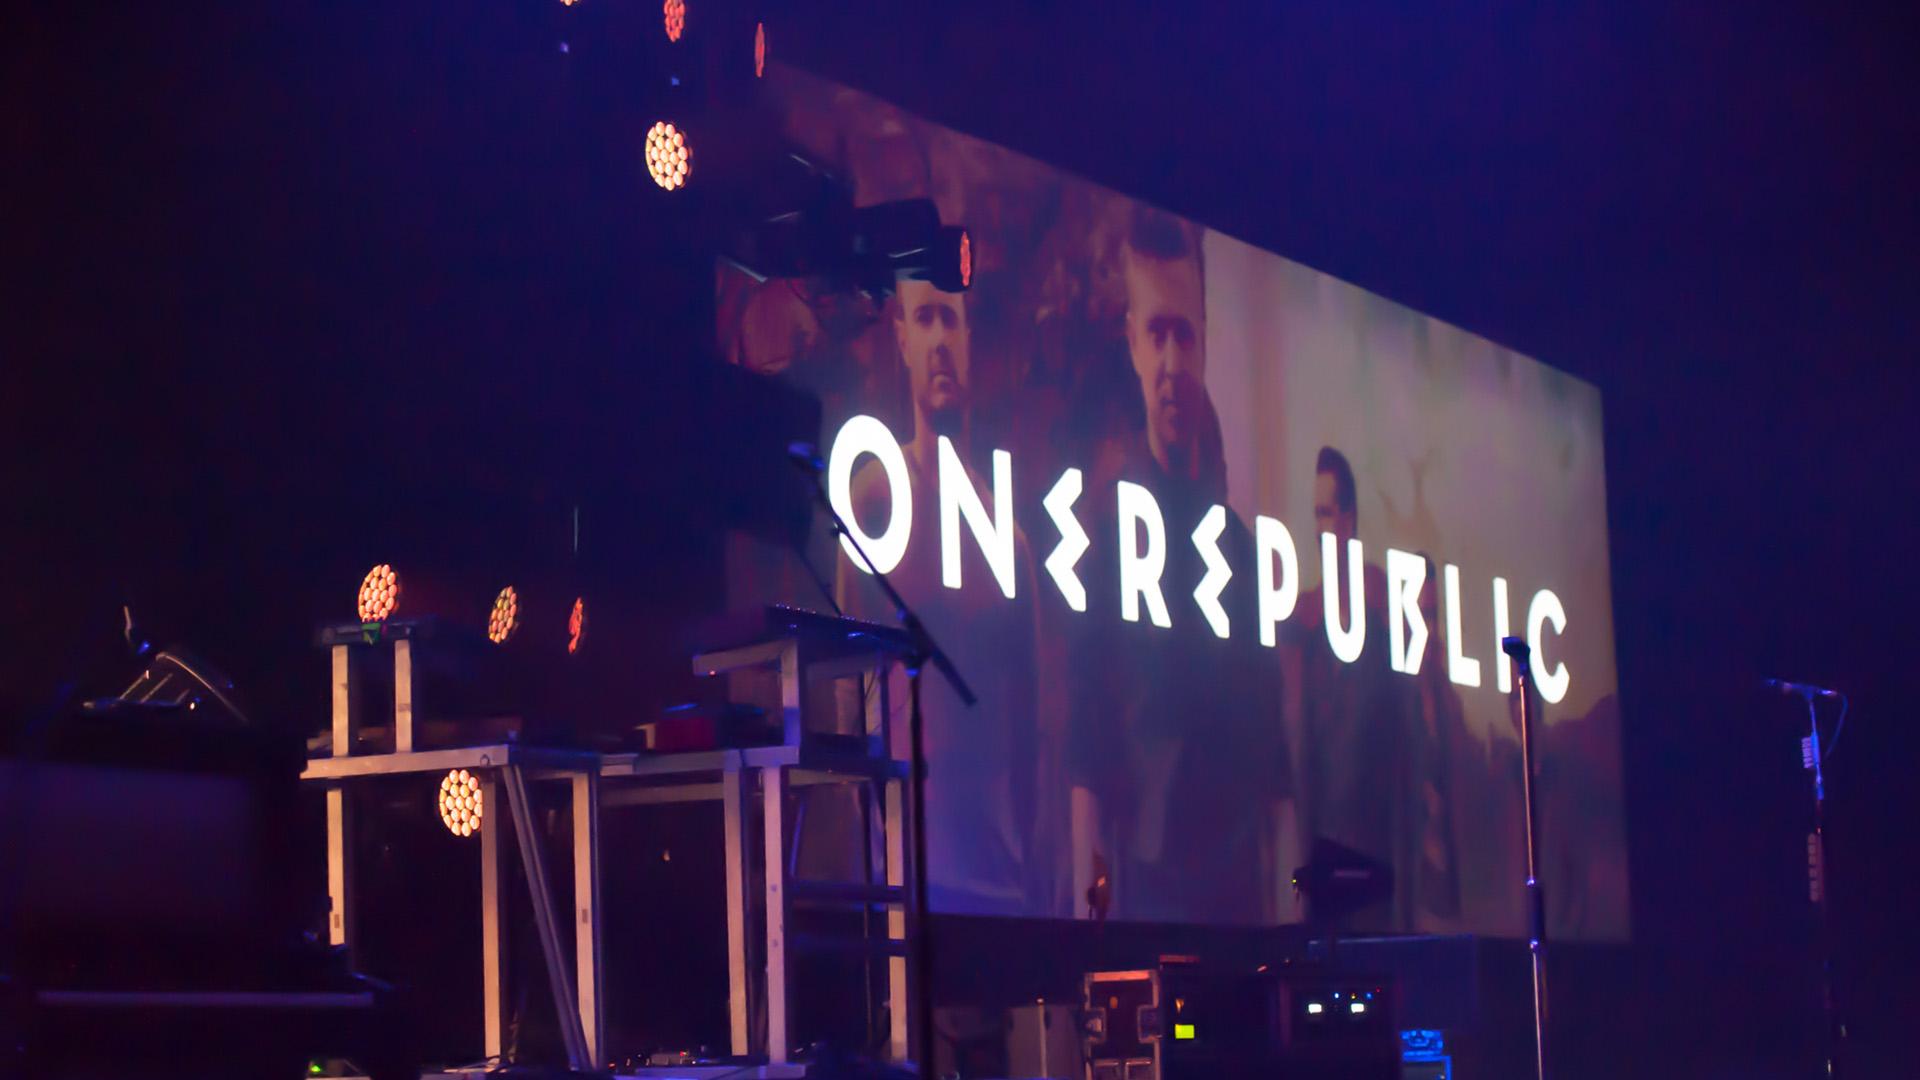 Siro World One Republic Concert Orlando Florida 4